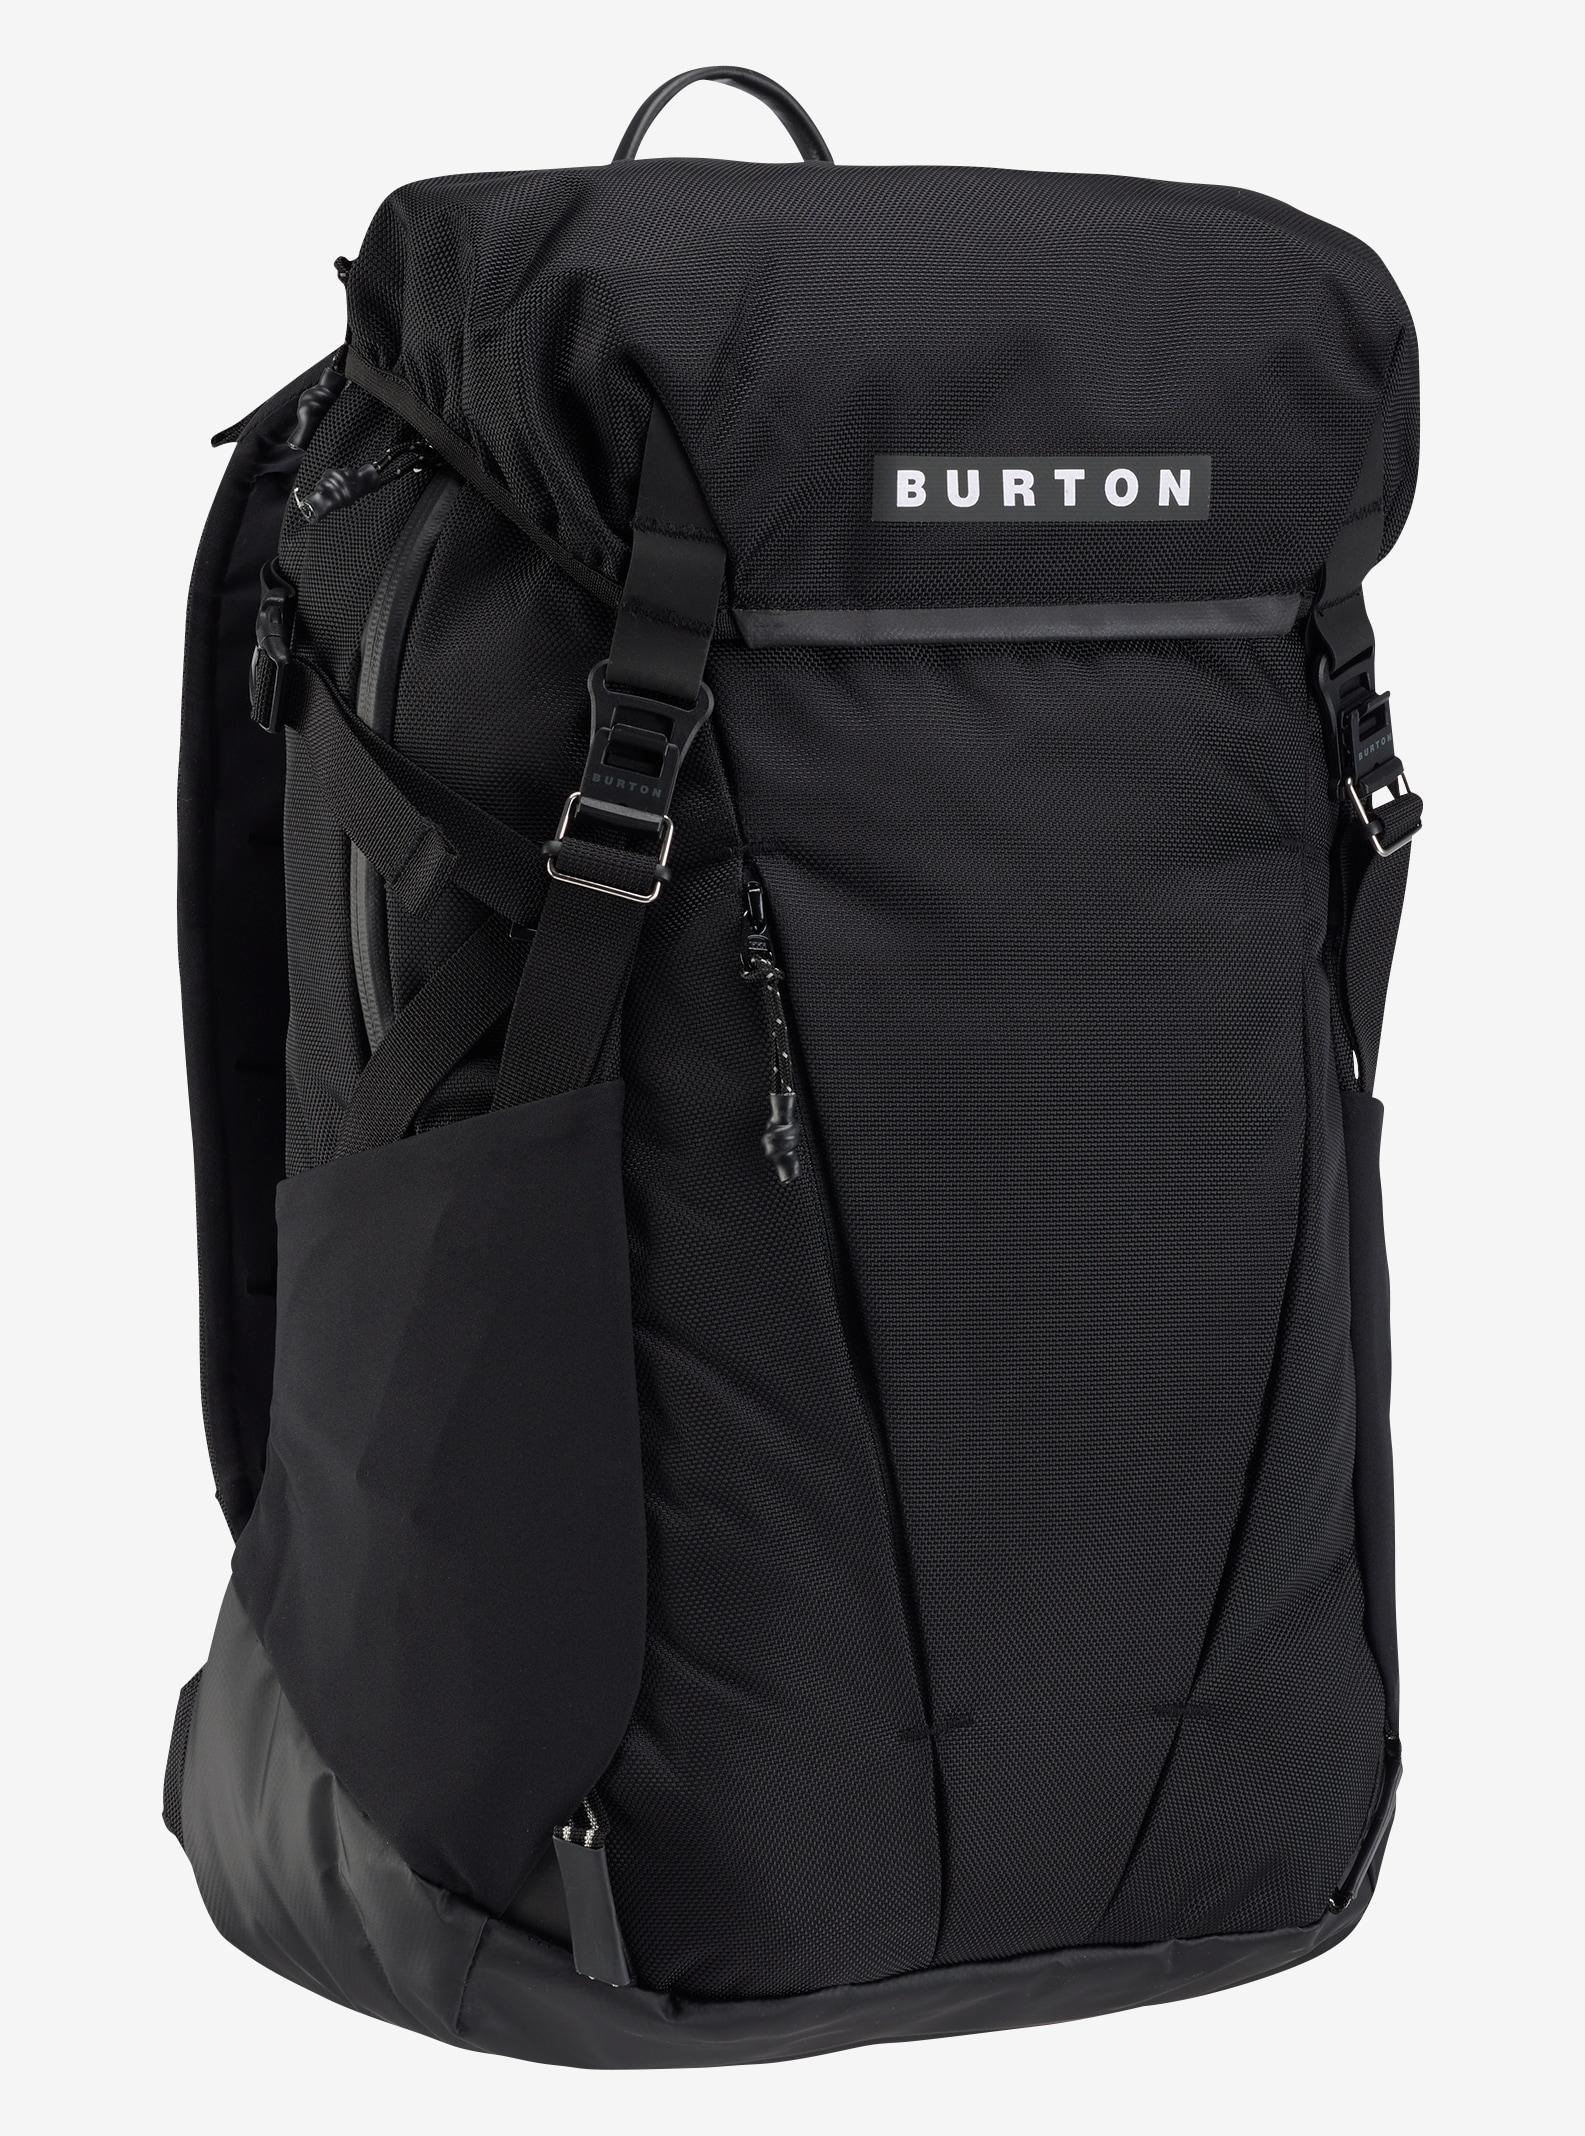 Burton Spruce Backpack shown in True Black Ballistic